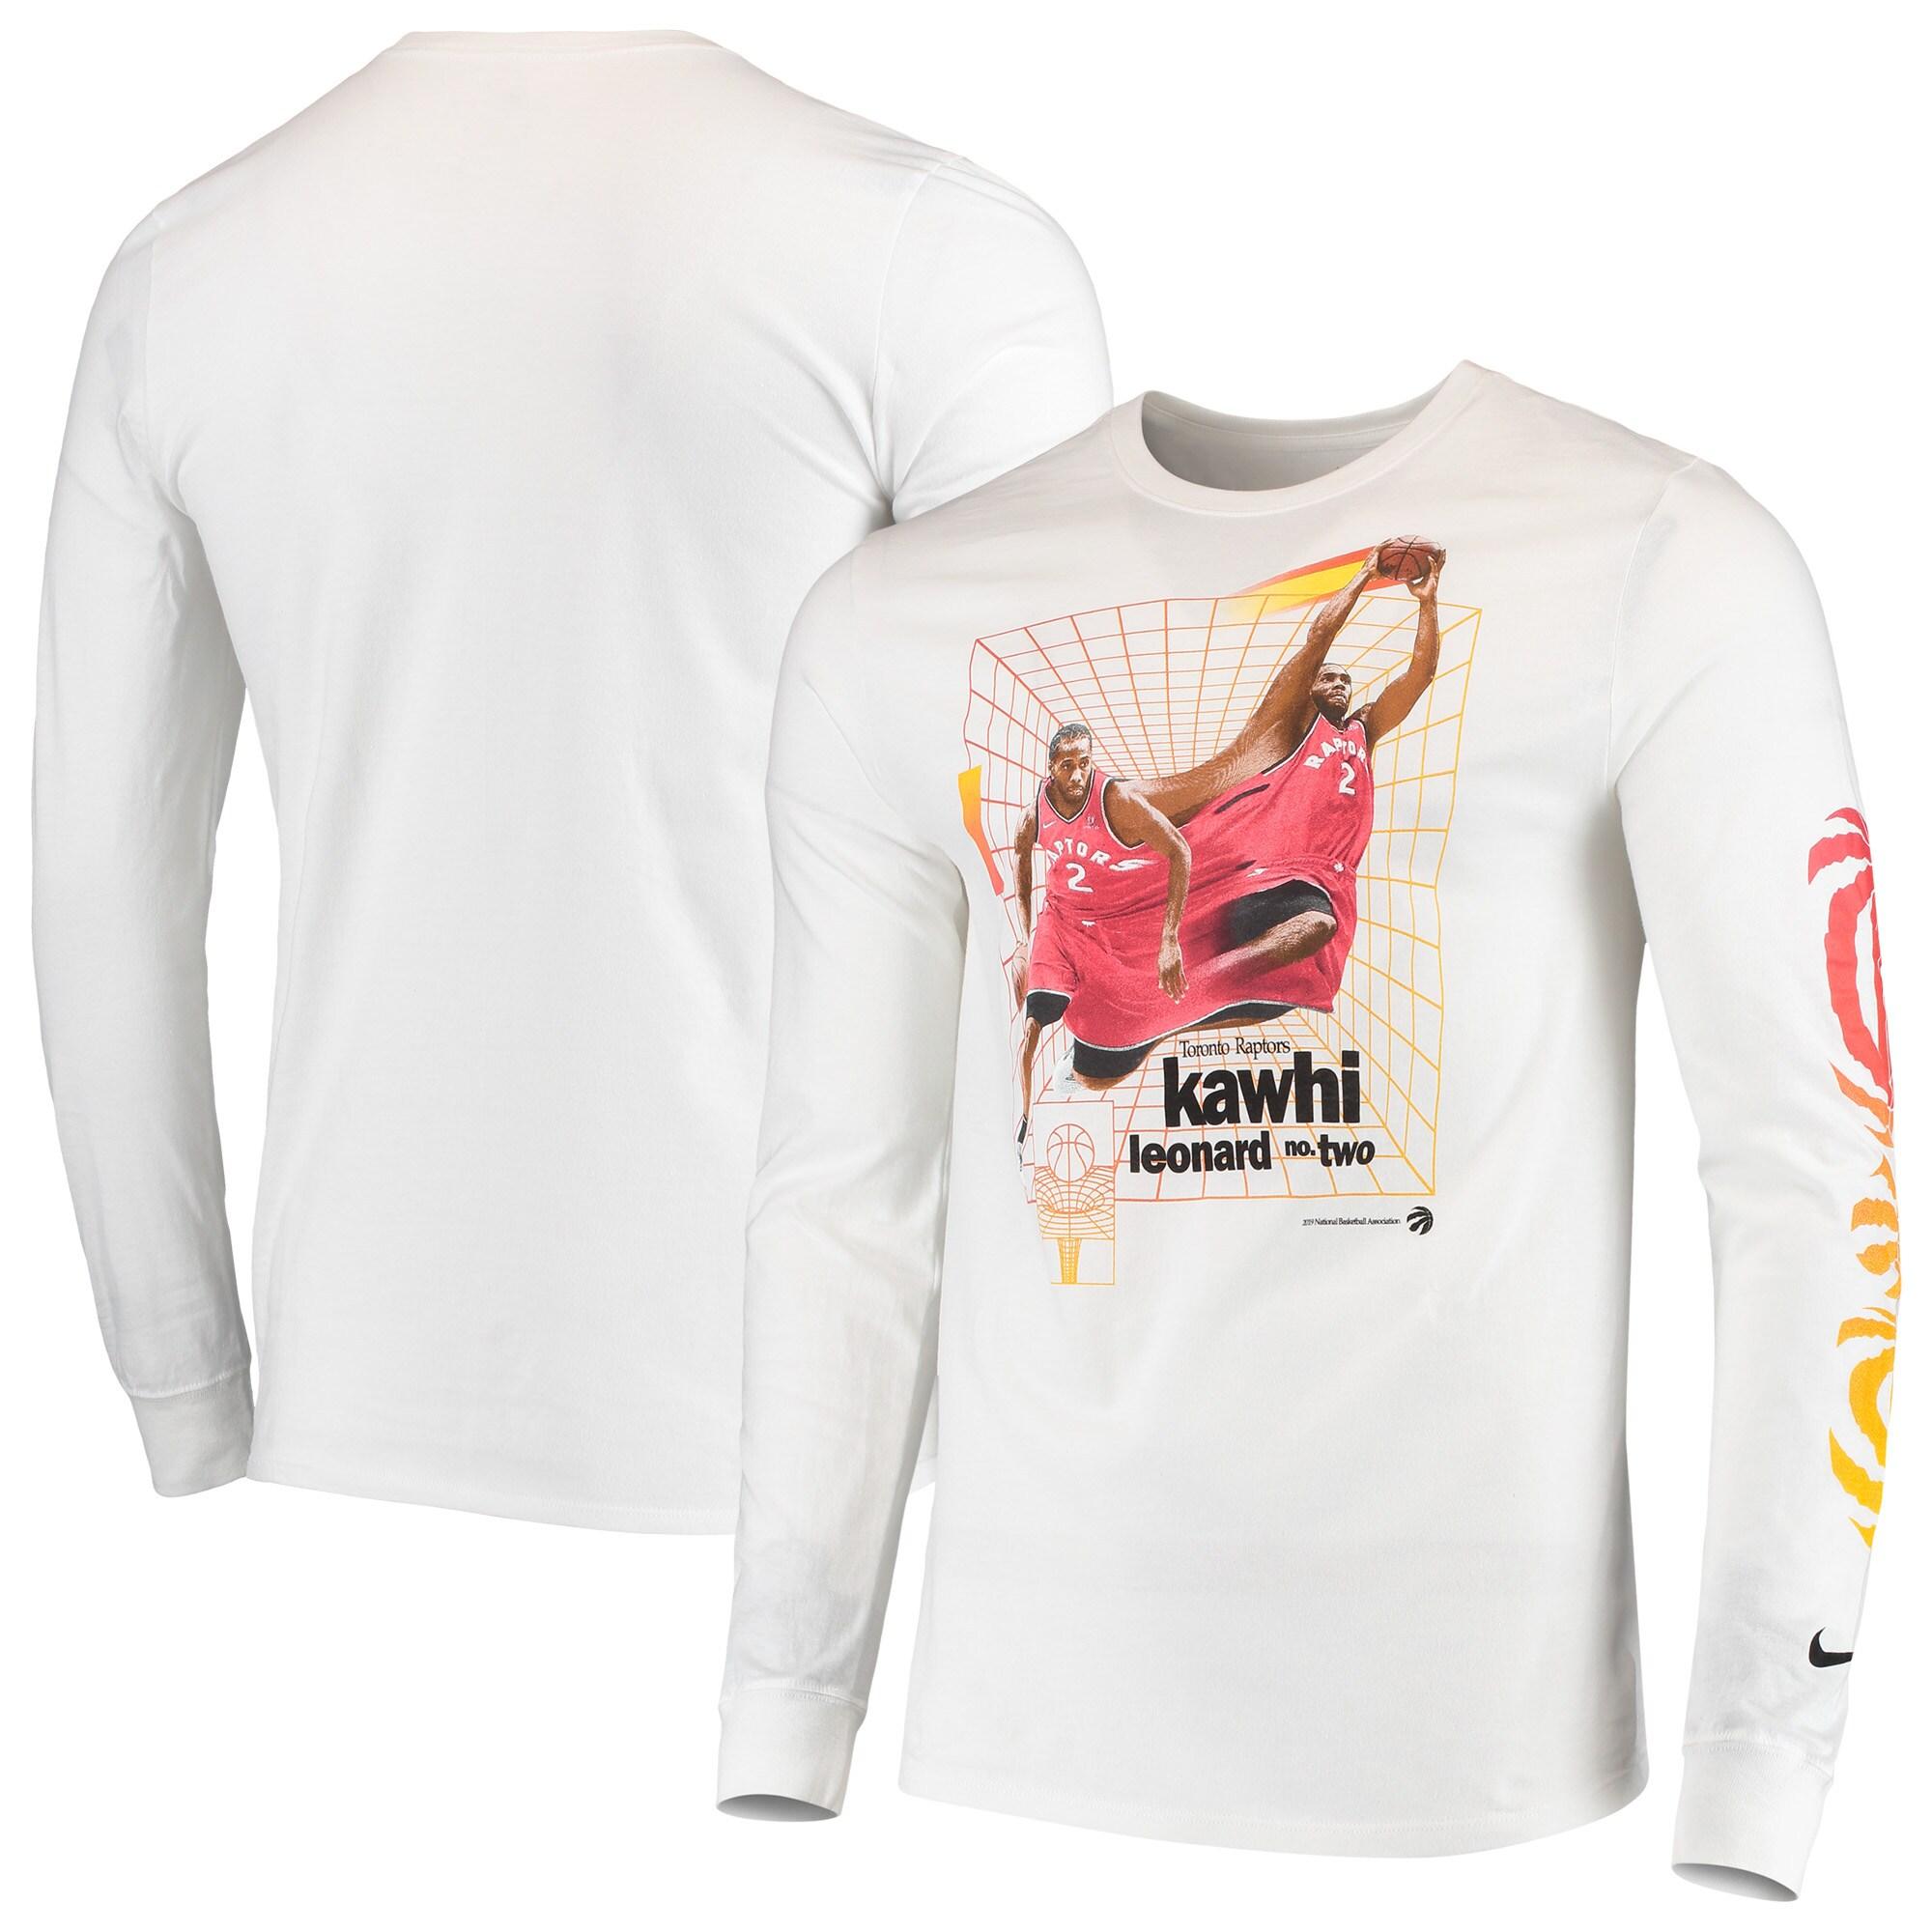 Kawhi Leonard Toronto Raptors Nike Time Warp Long Sleeve T-Shirt - White